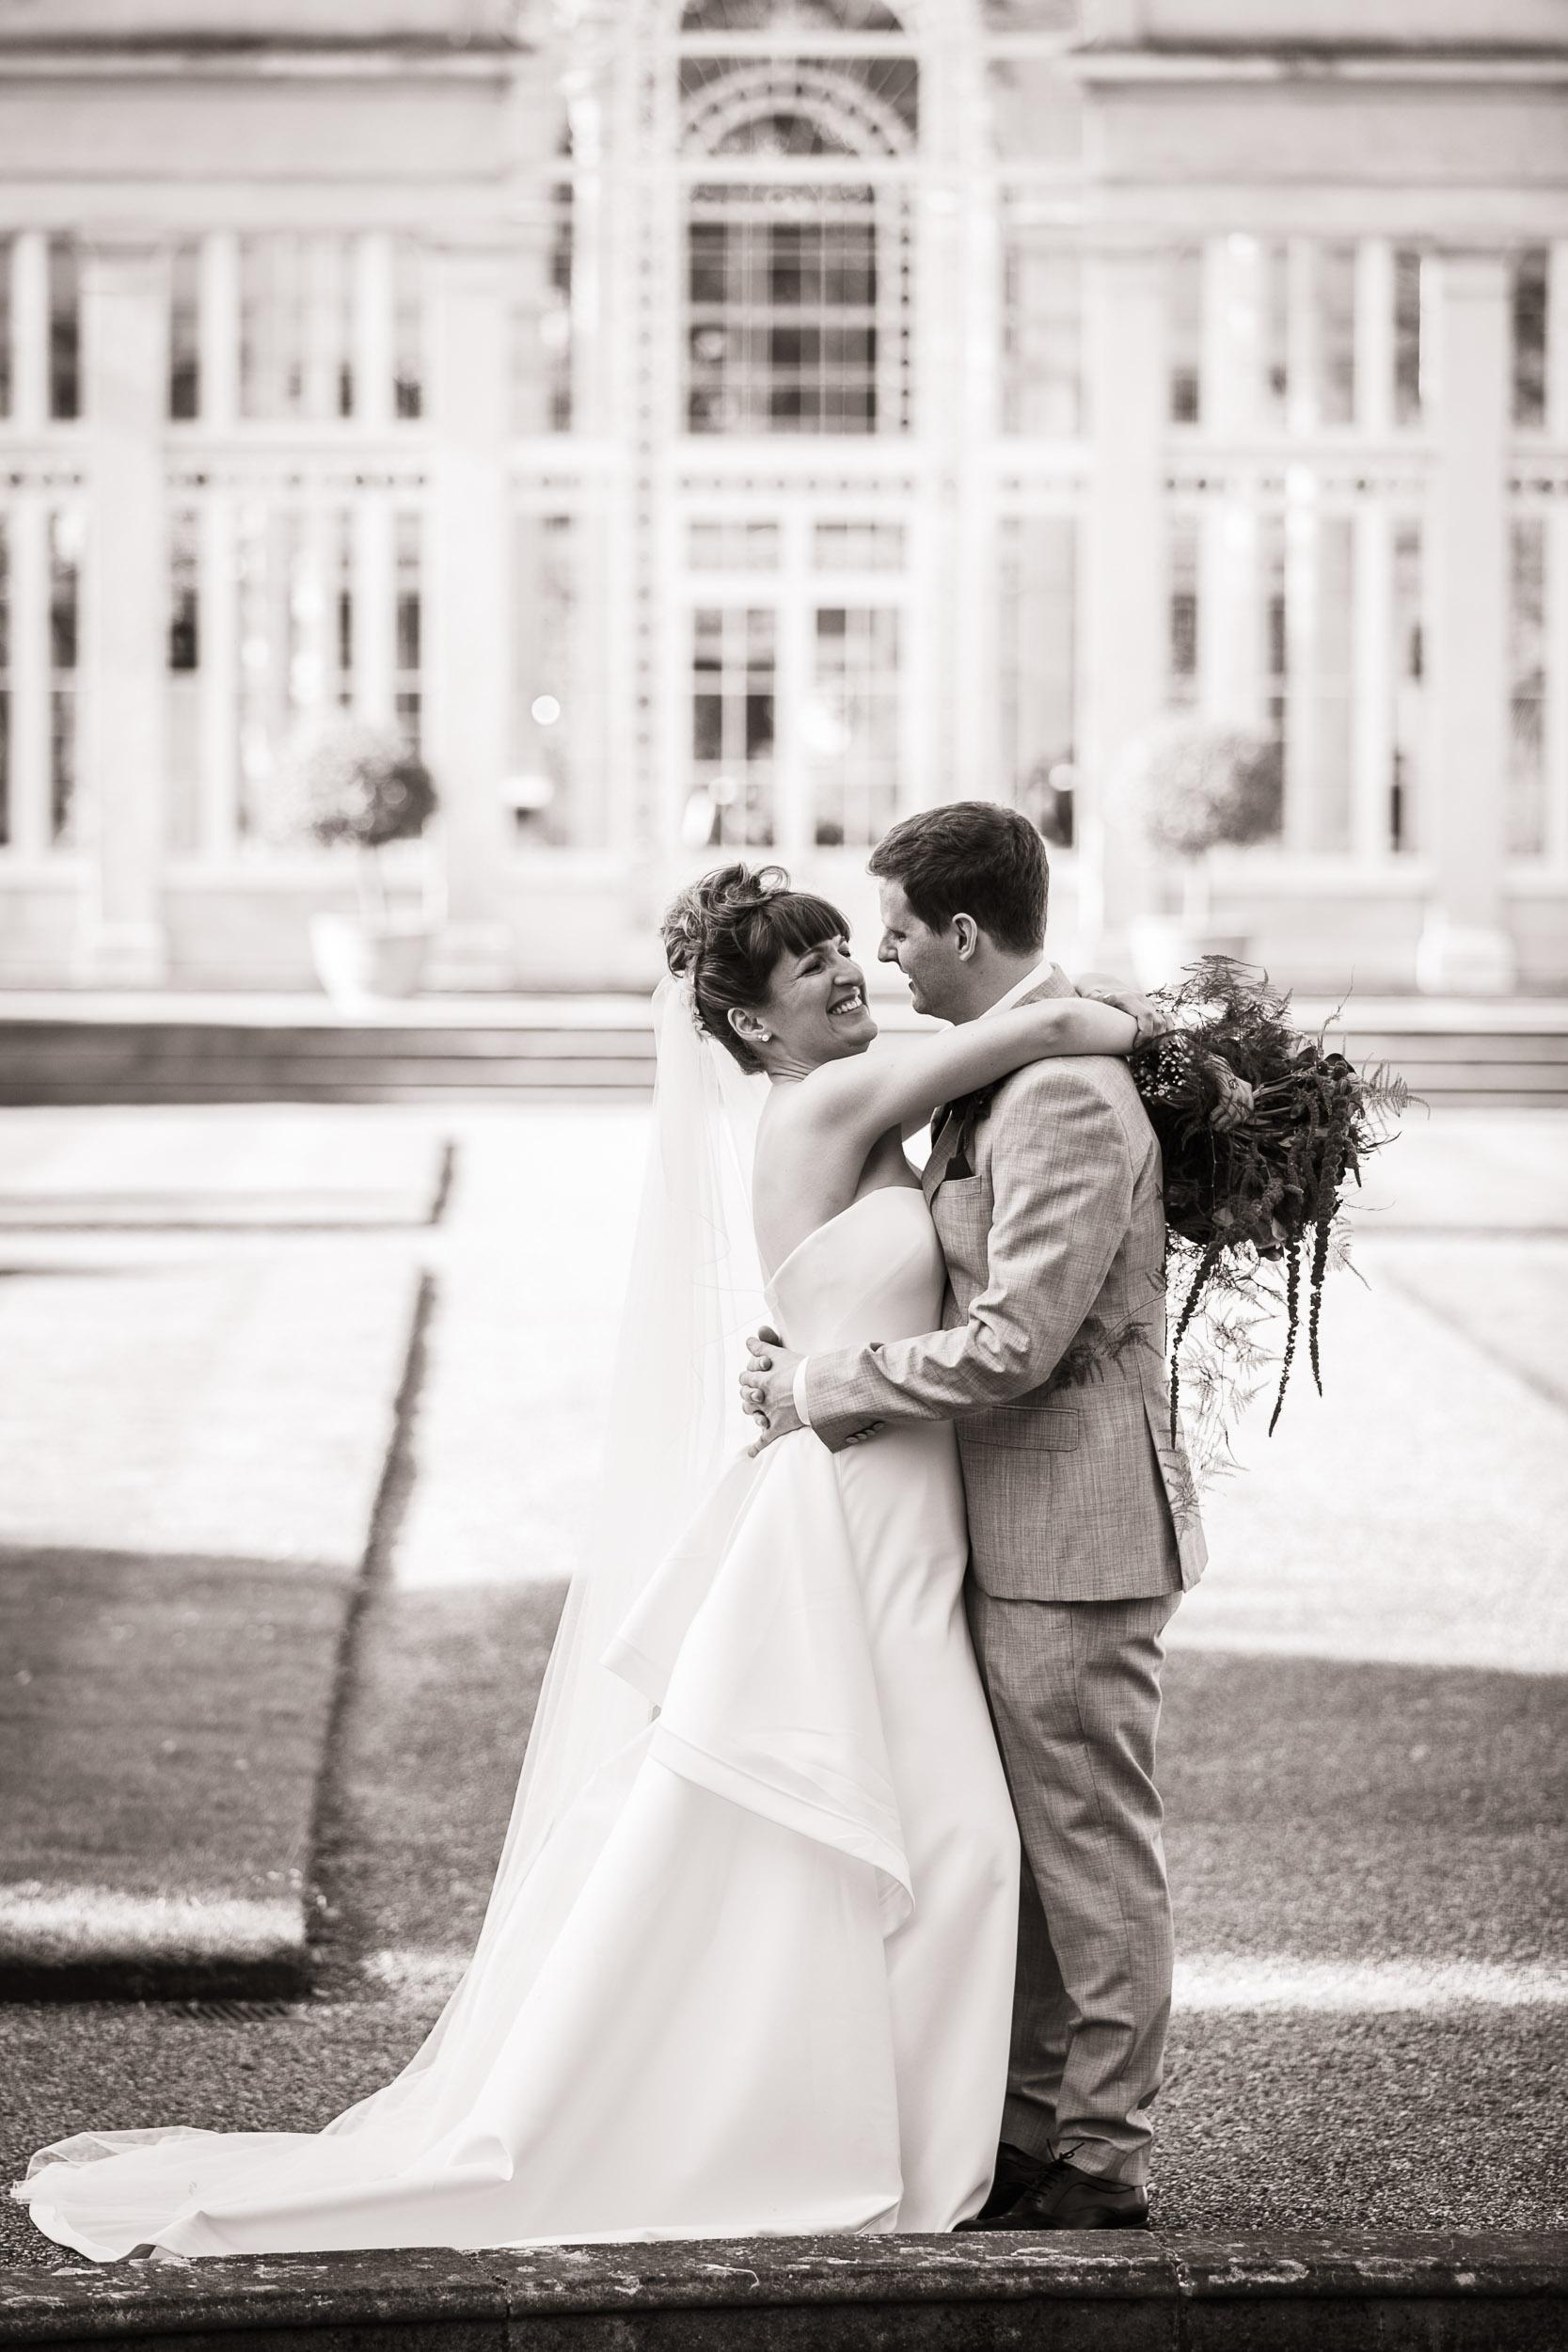 syon-house-wedding-photographer-london 107.jpg